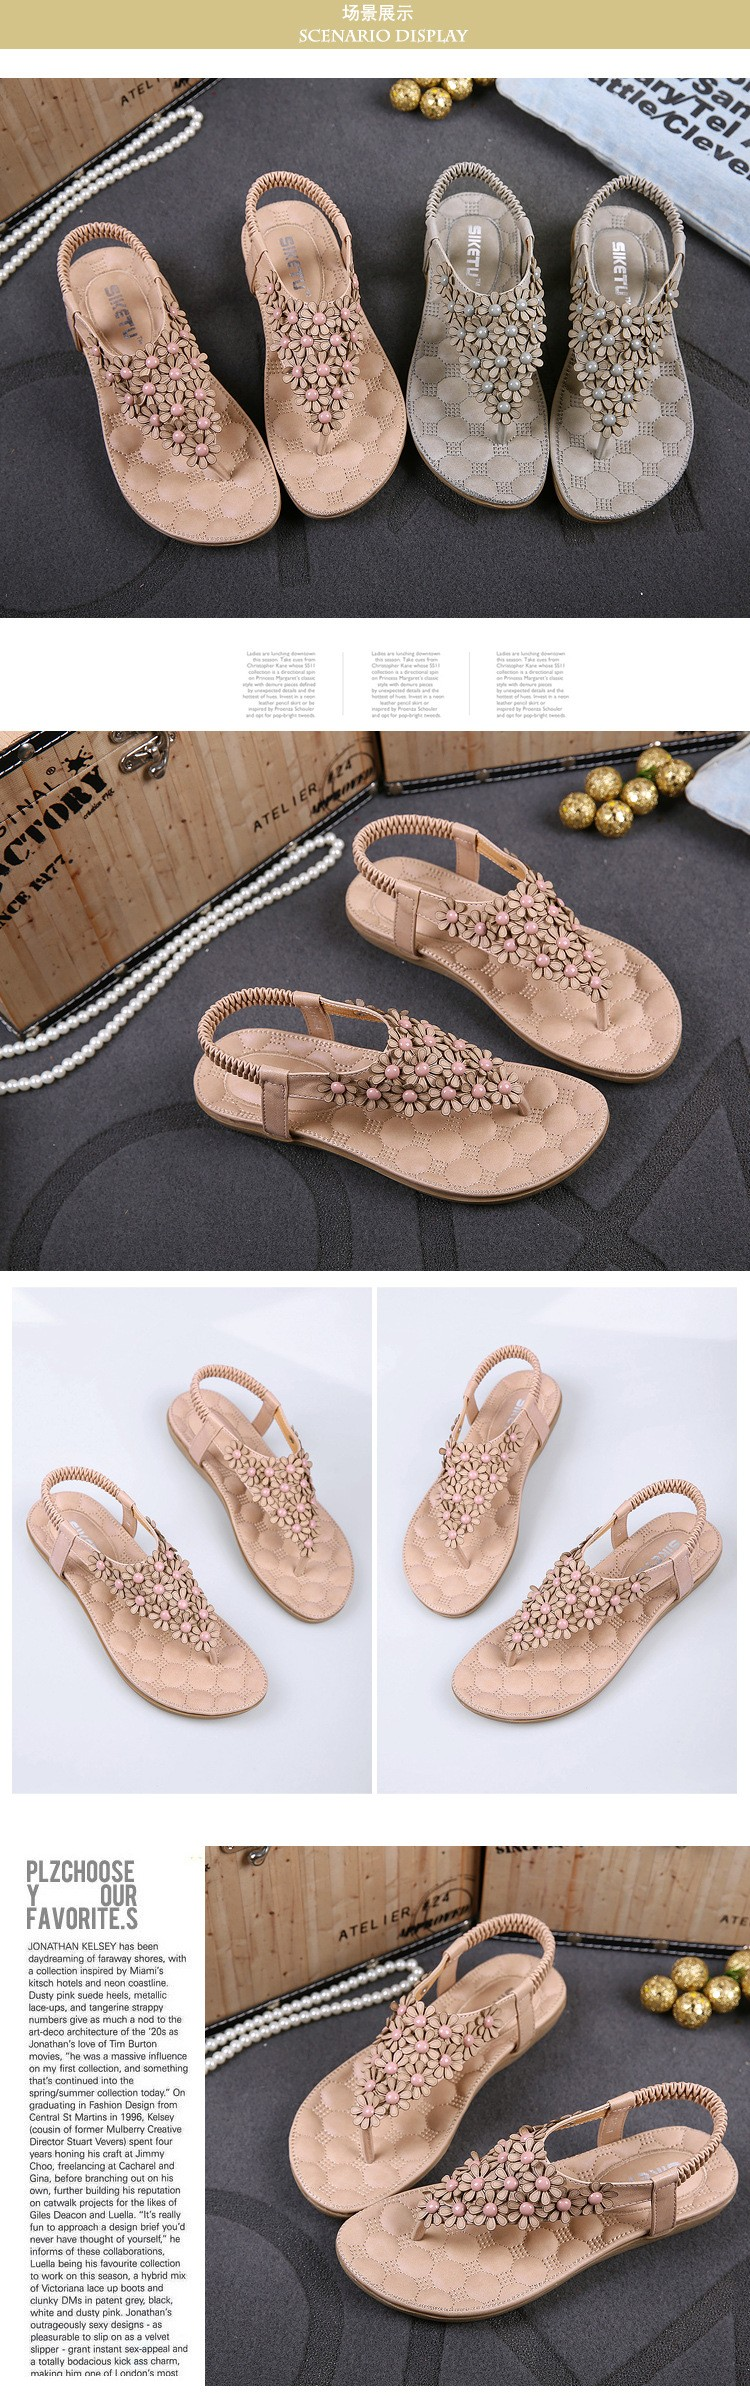 Bohemia Womens Sandals Summer 2016 Fashion Elastic Band Flip Flops Women Beach Sandals Flowers Flat Slippers Sandale Femme NX70